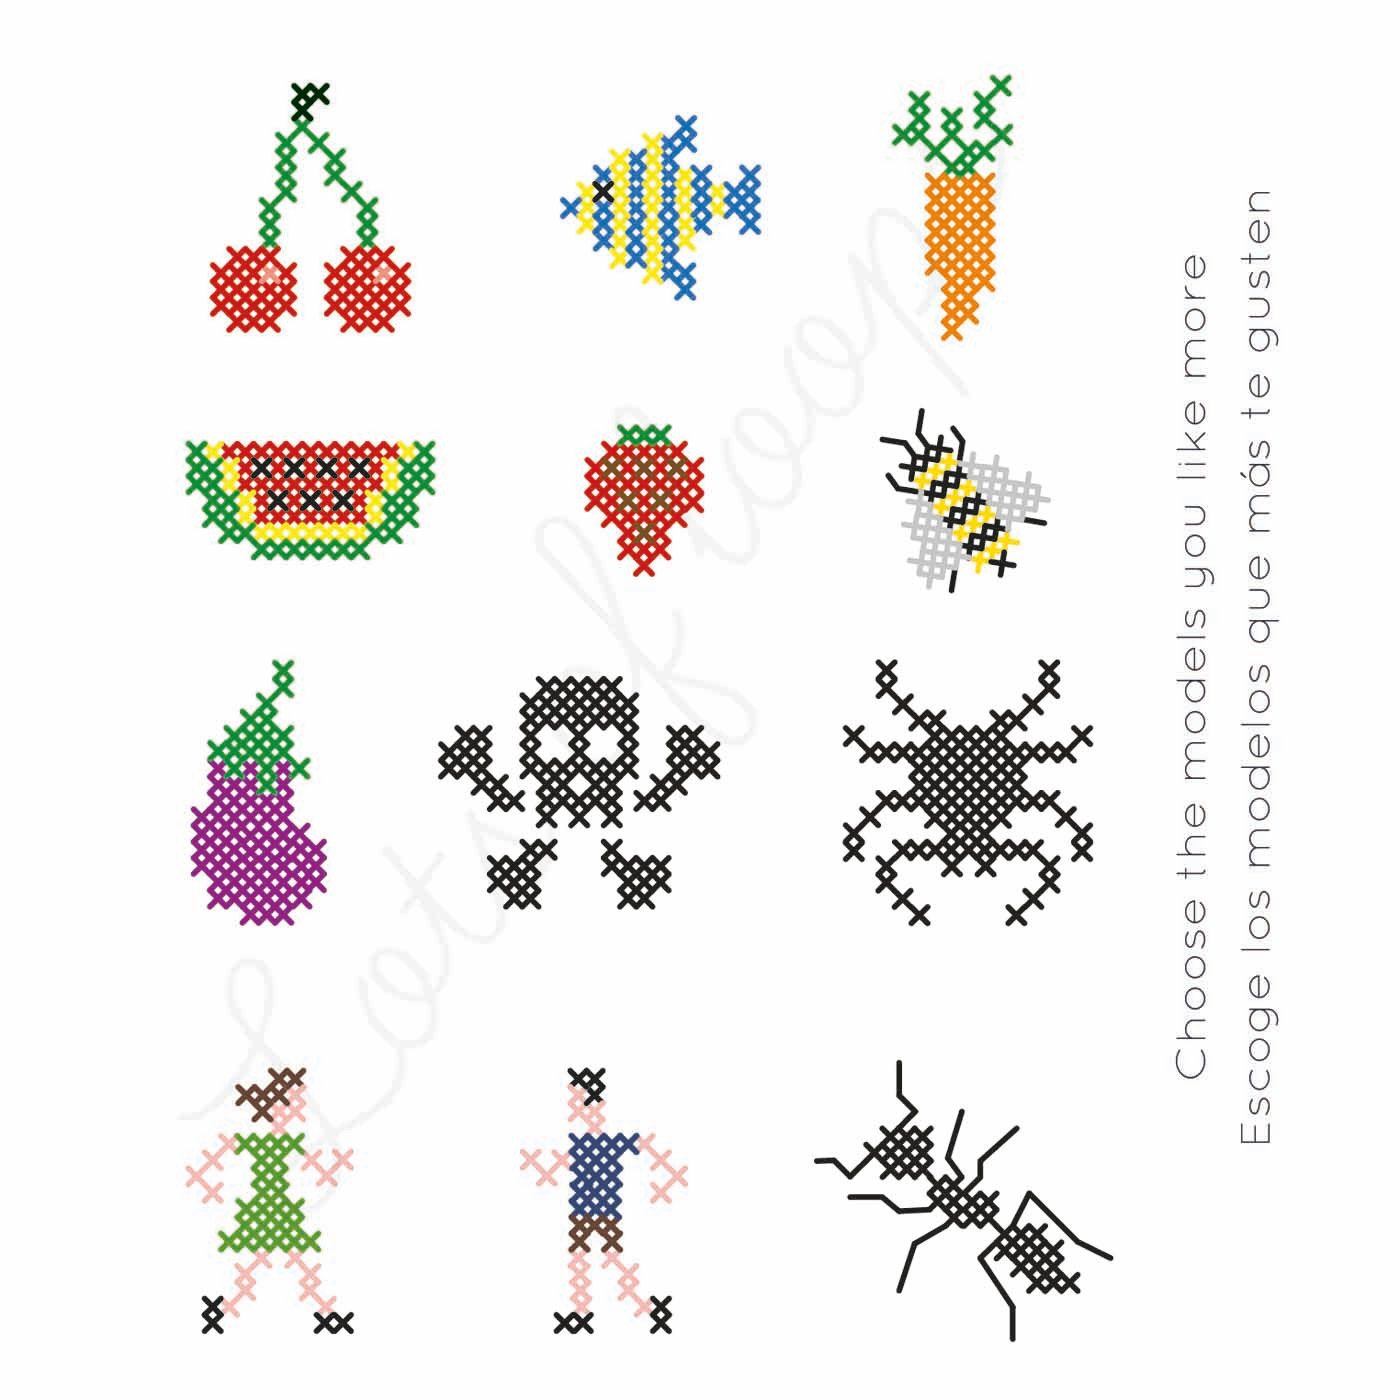 DIY Cross Stitch Kit for Kids, 2 units Puntos de bordado